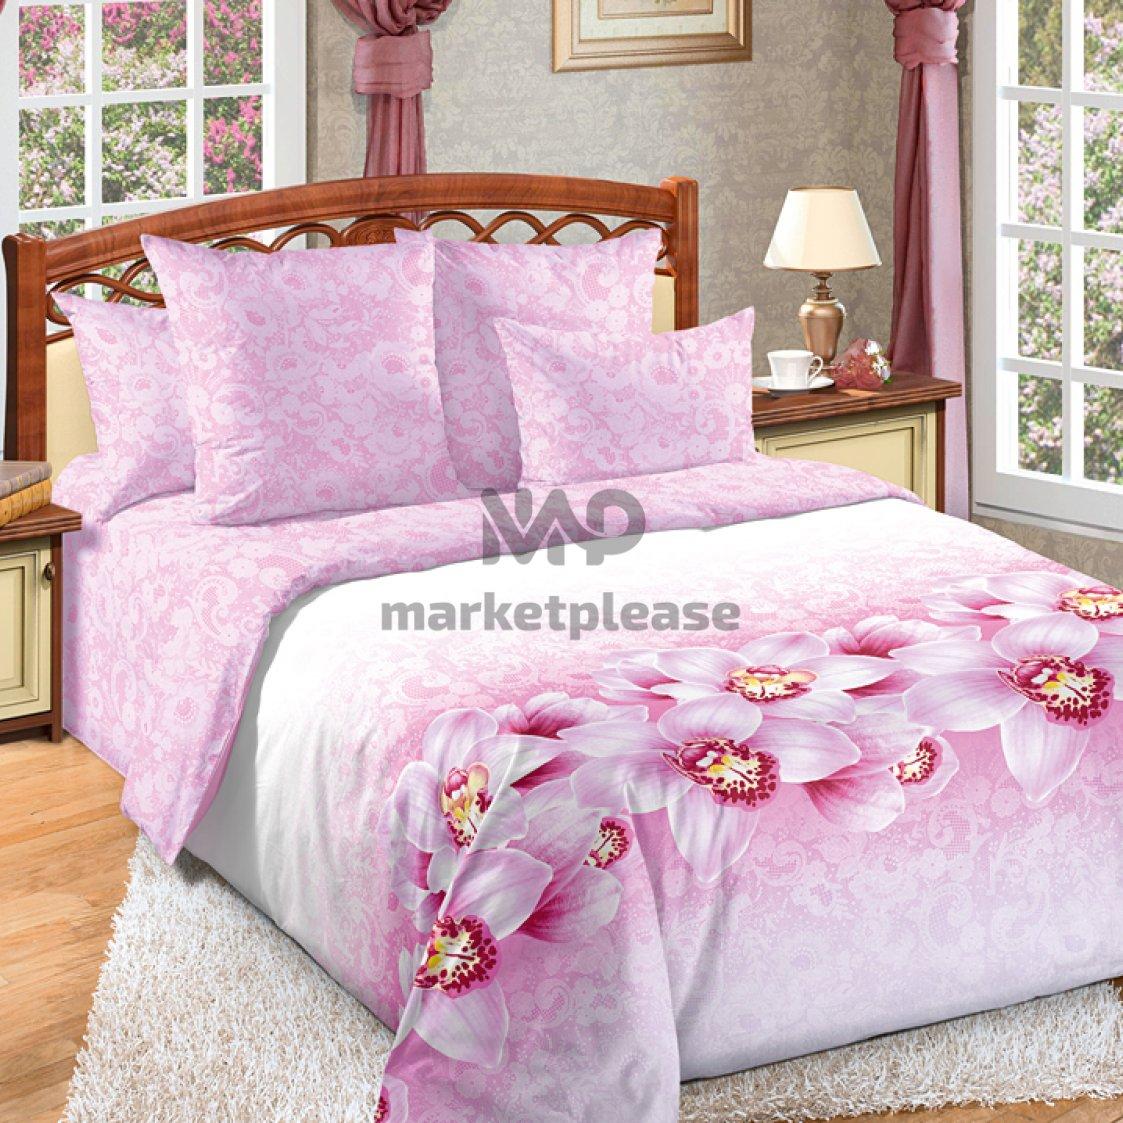 "Рулон ткани перкаль ""Аромат орхидеи"" 220 см"